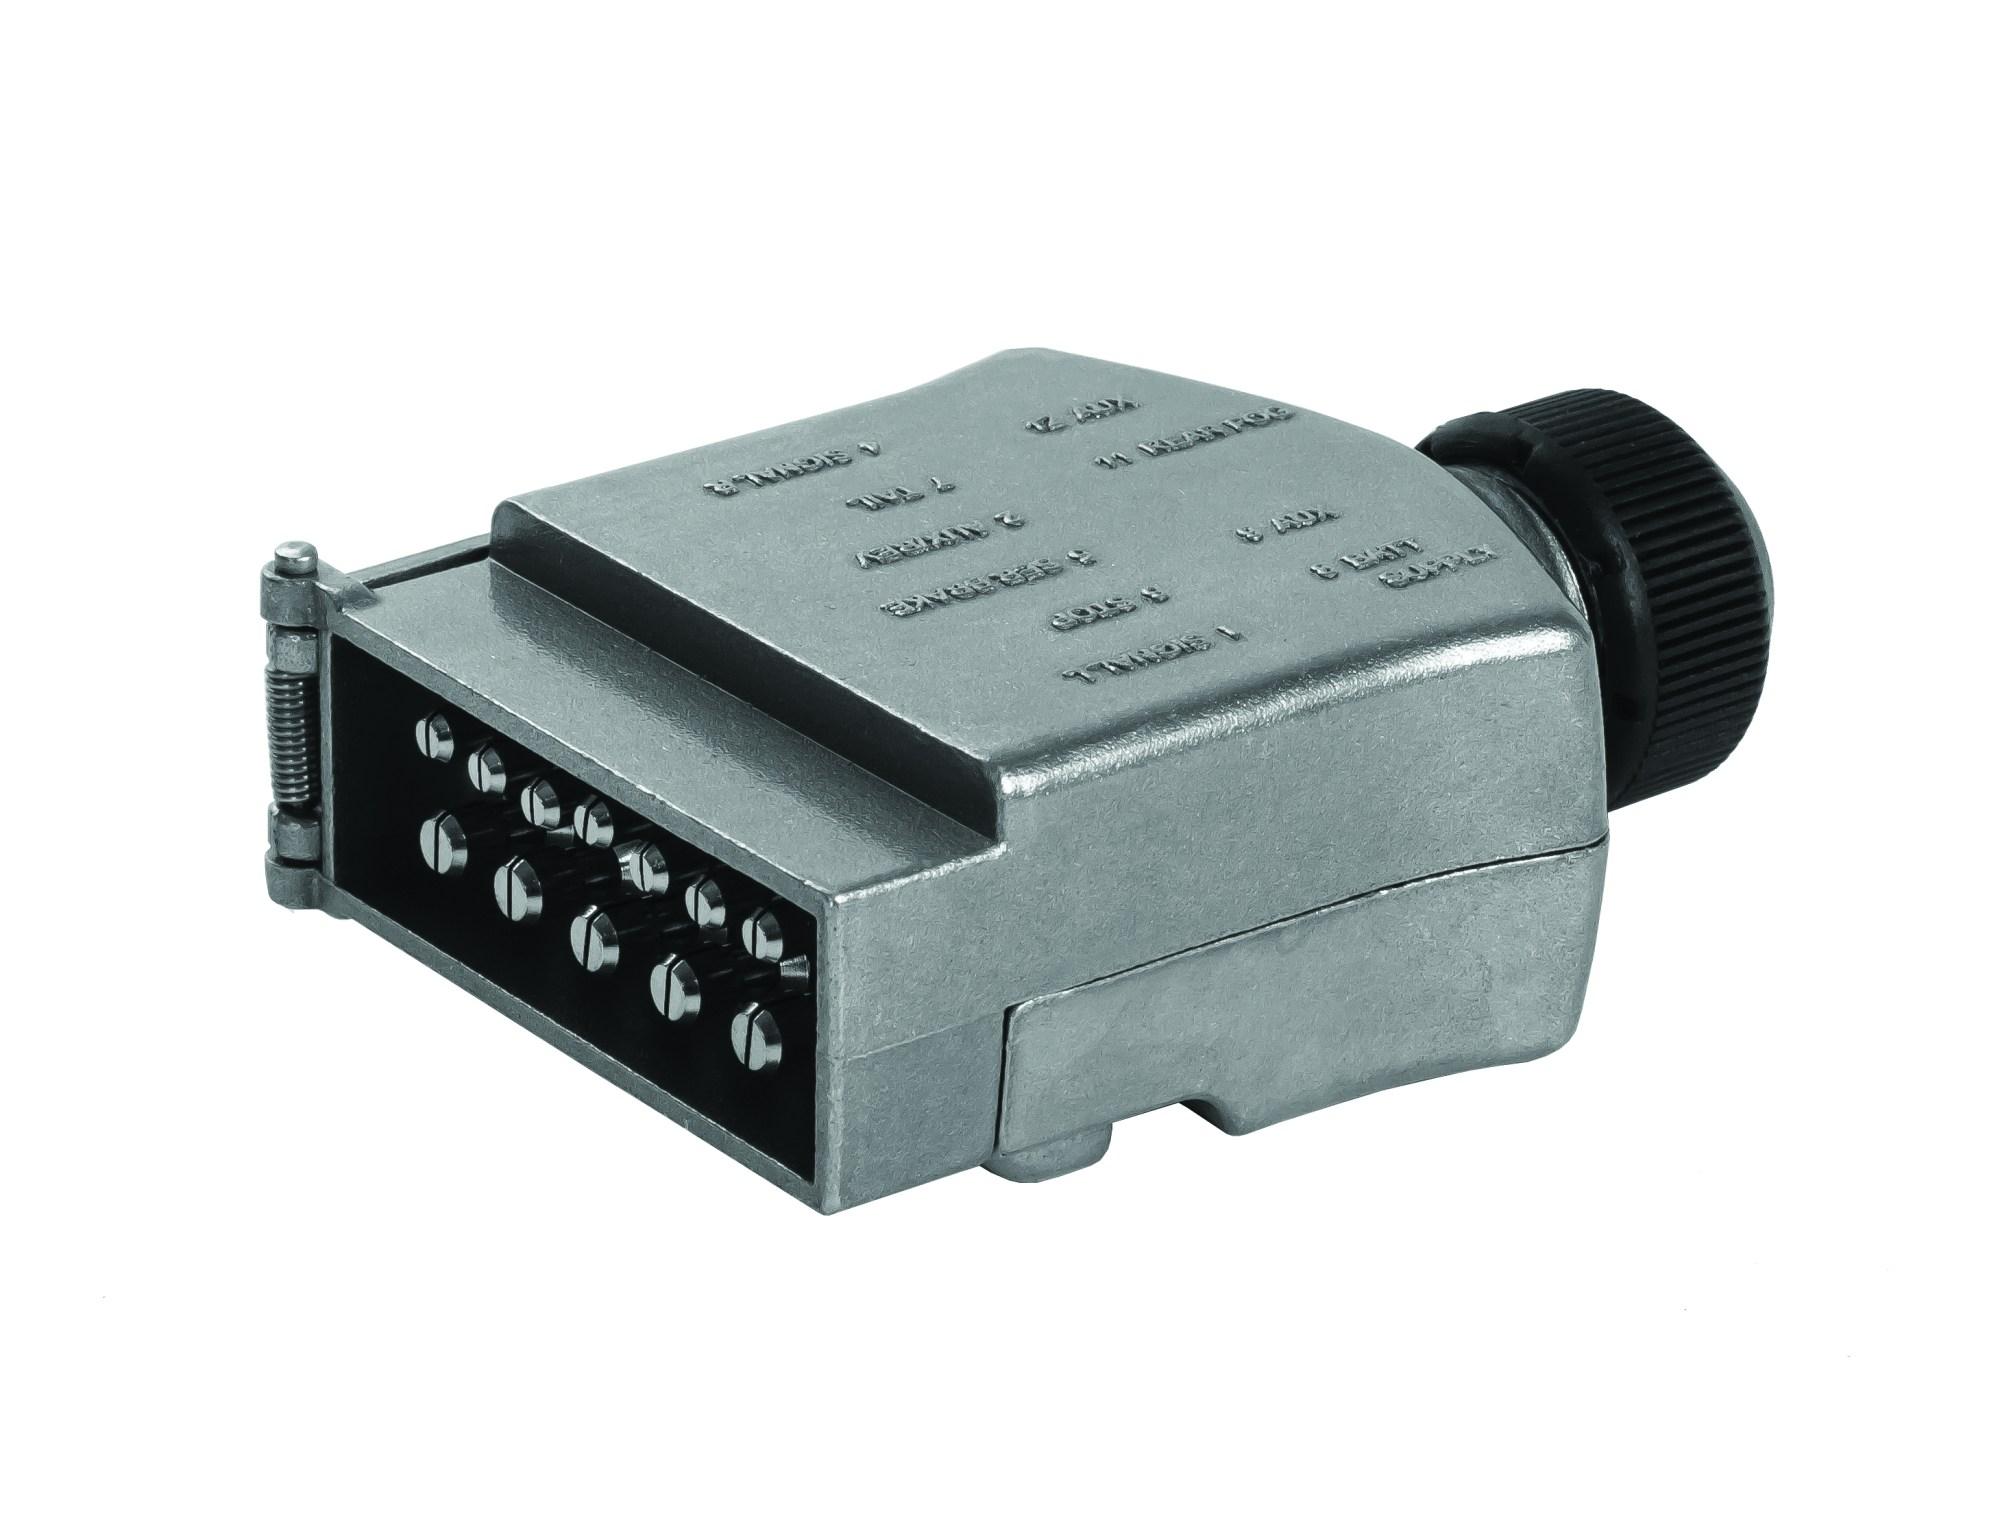 hight resolution of rv 7 pin trailer plug wiring diagram moreover ford 7 pin trailer plug